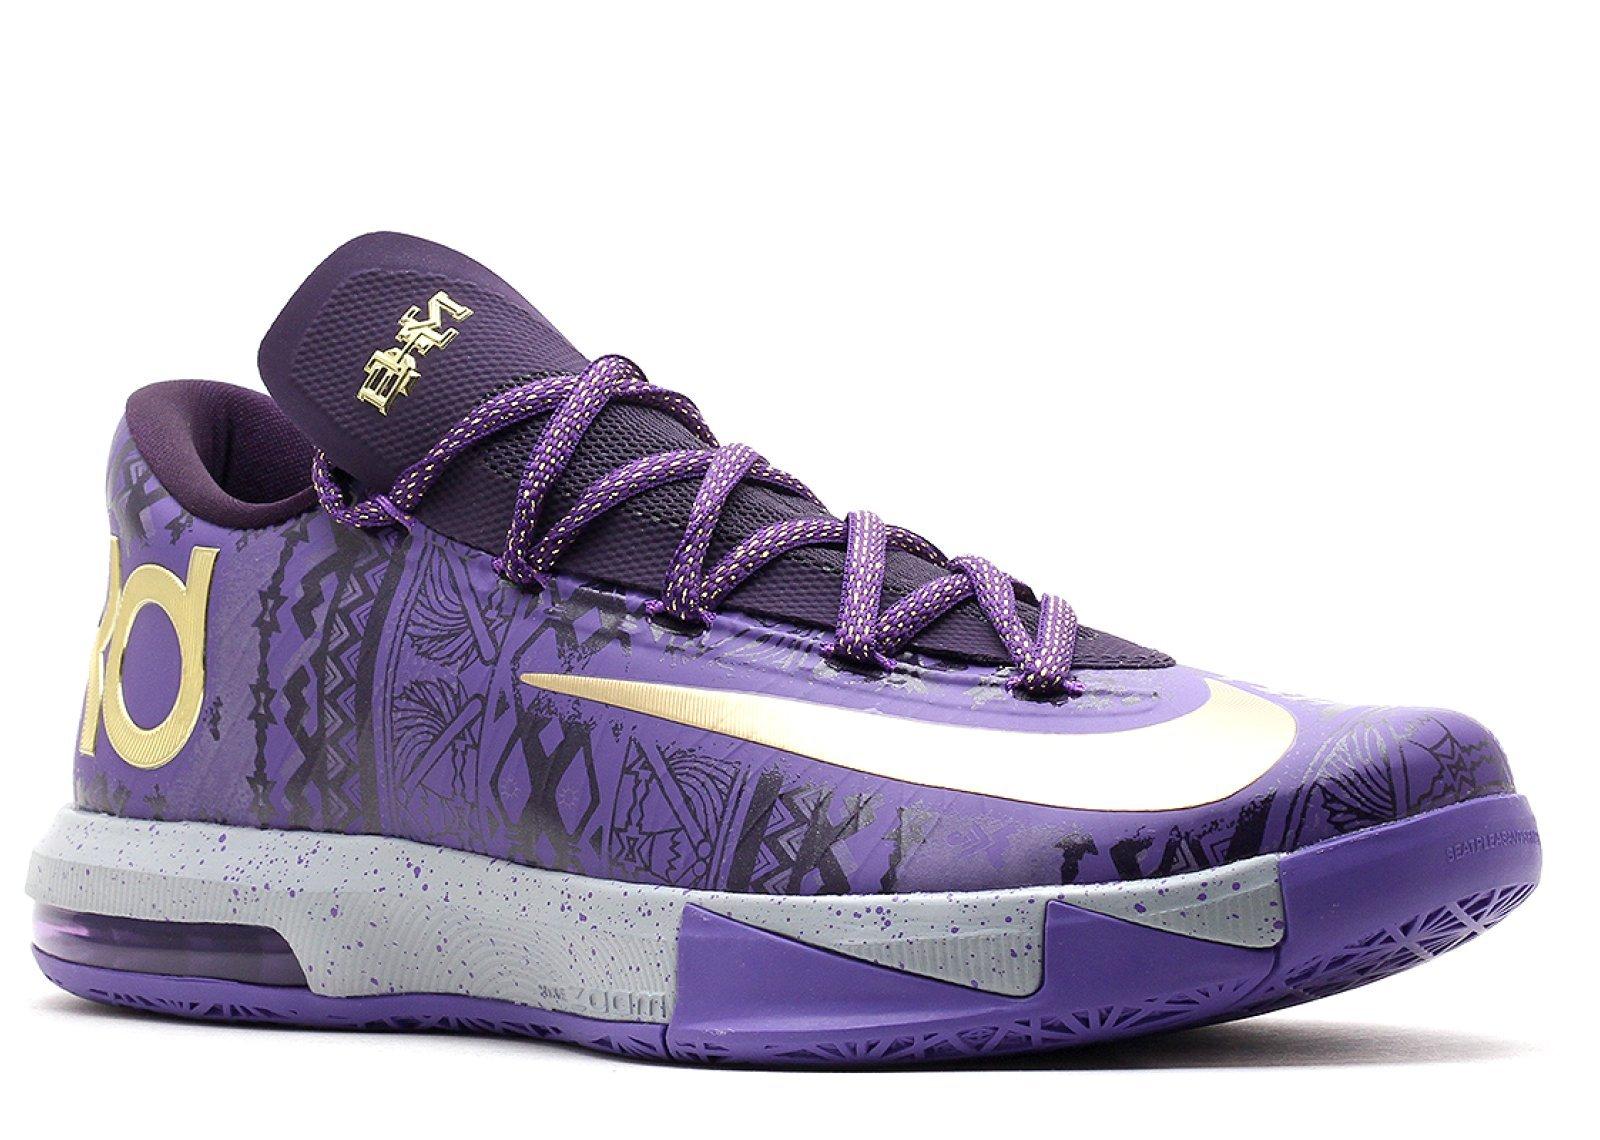 Nike KD VI BHM Mens Basketball Trainers